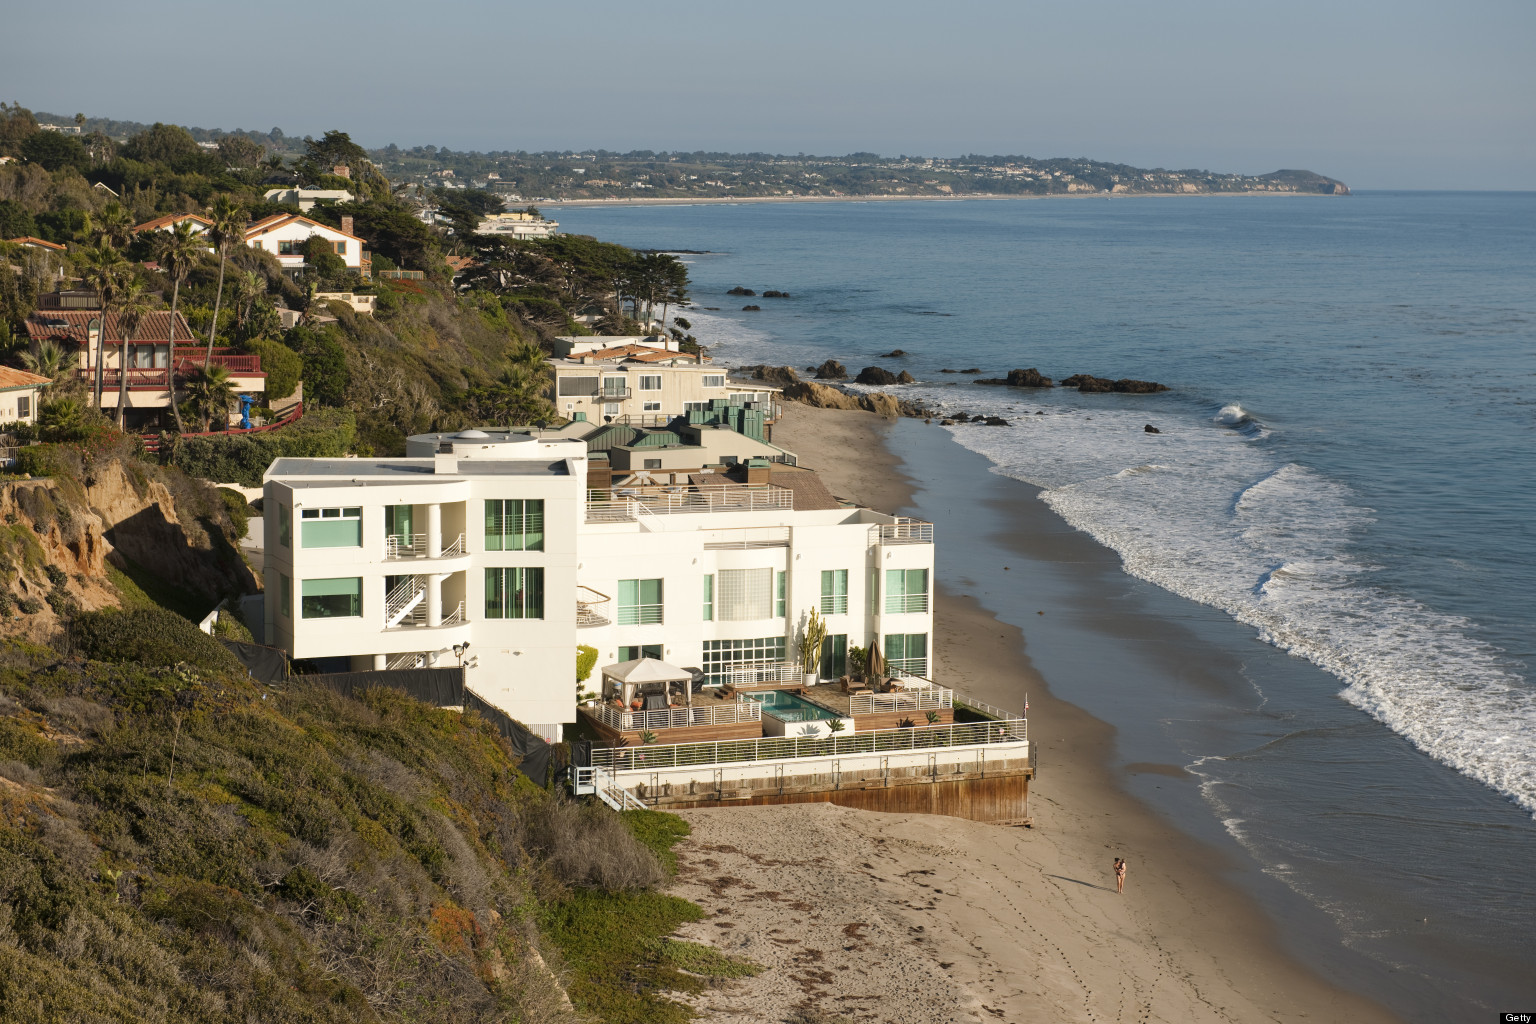 Malibu is awash in expensive beach homes for sale huffpost for Malibu california beach houses